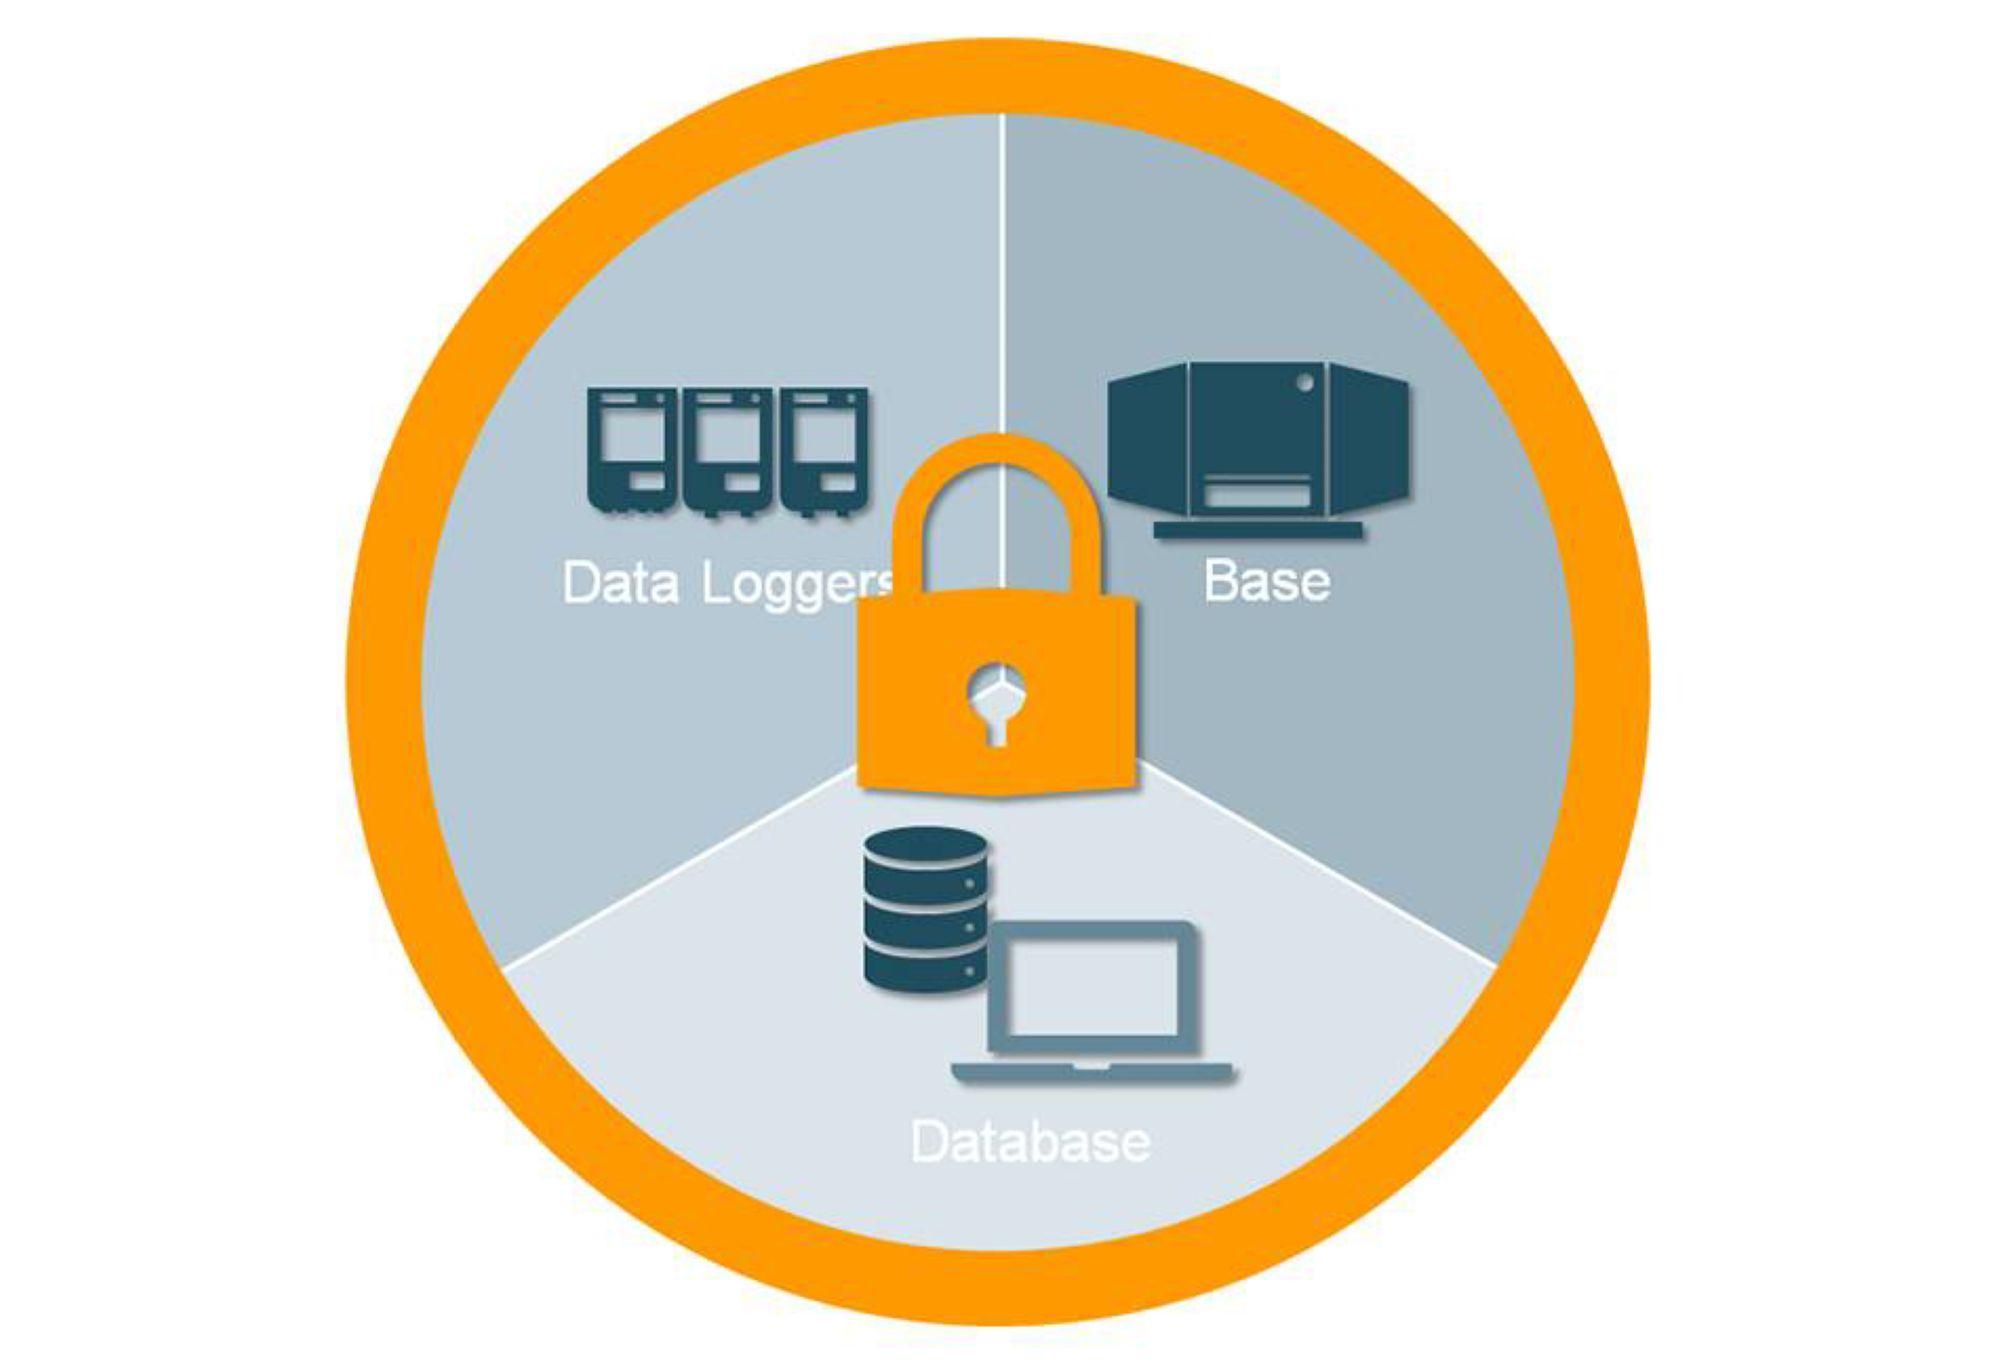 testo-solutions-monitoring-data-integrity-image.jpg